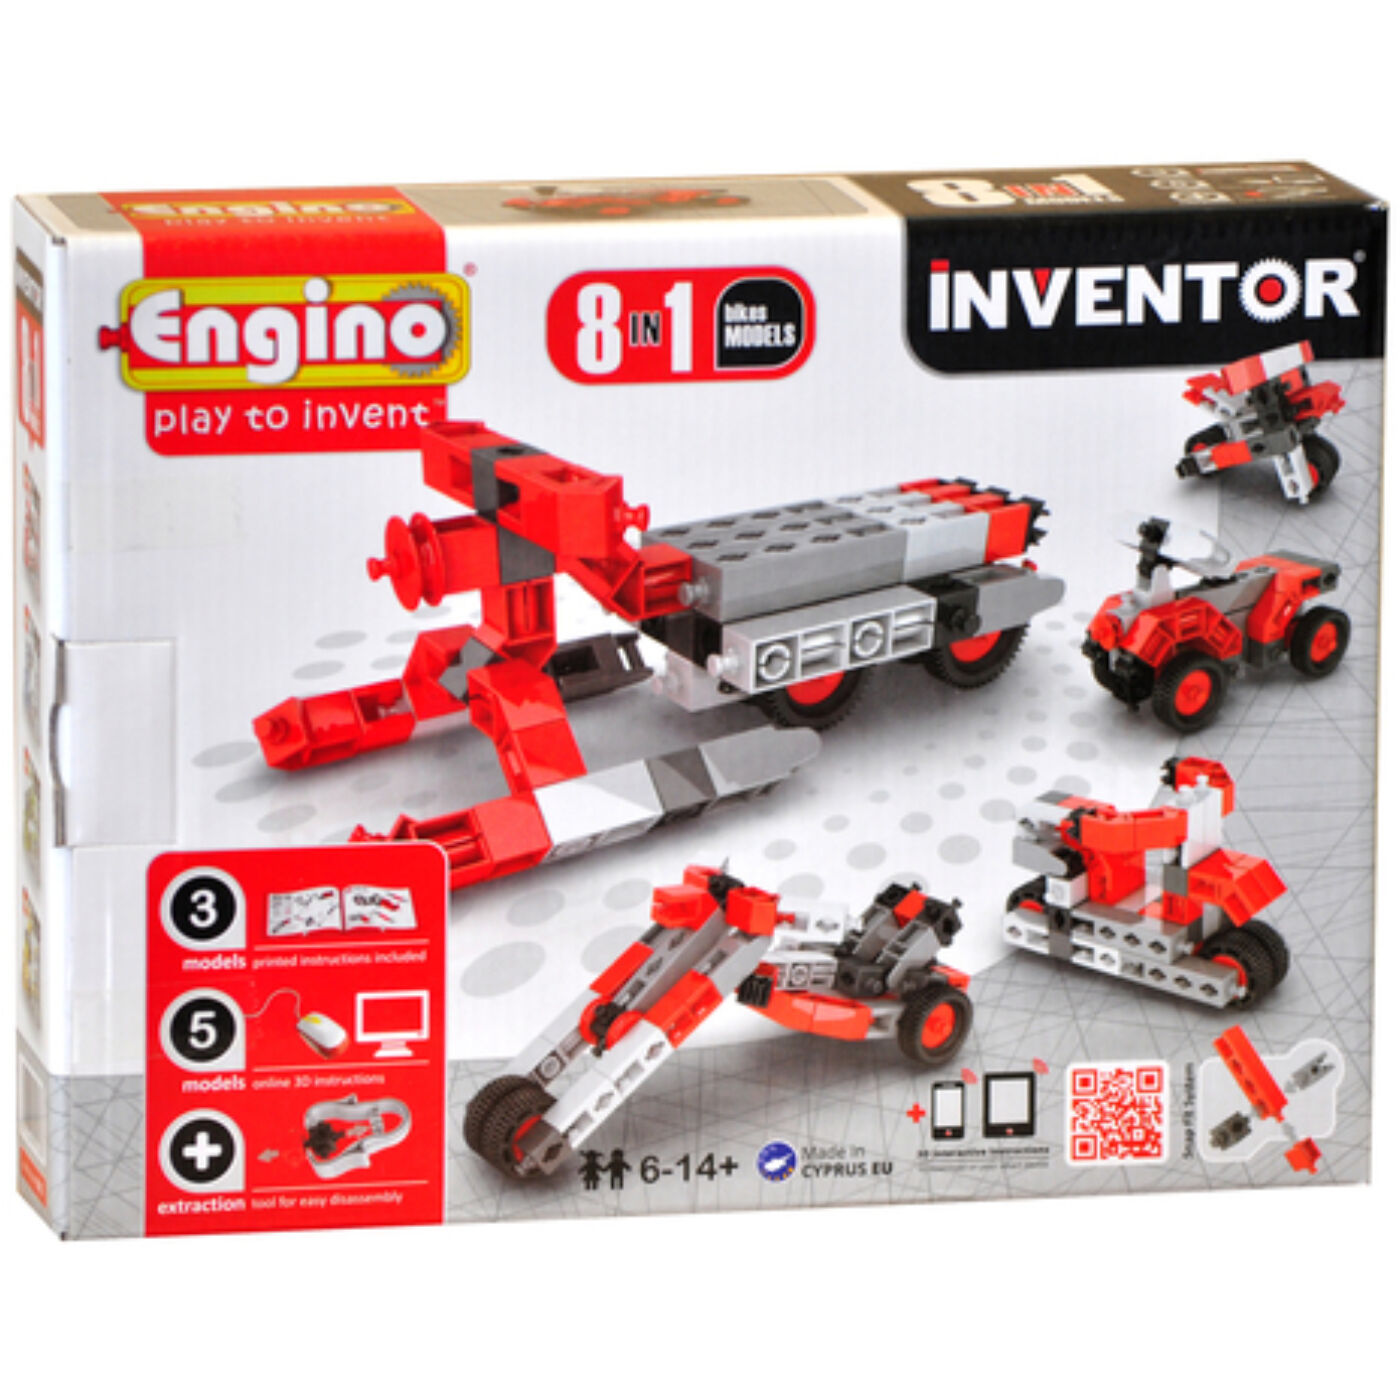 Engino Inventor motorok 8in1